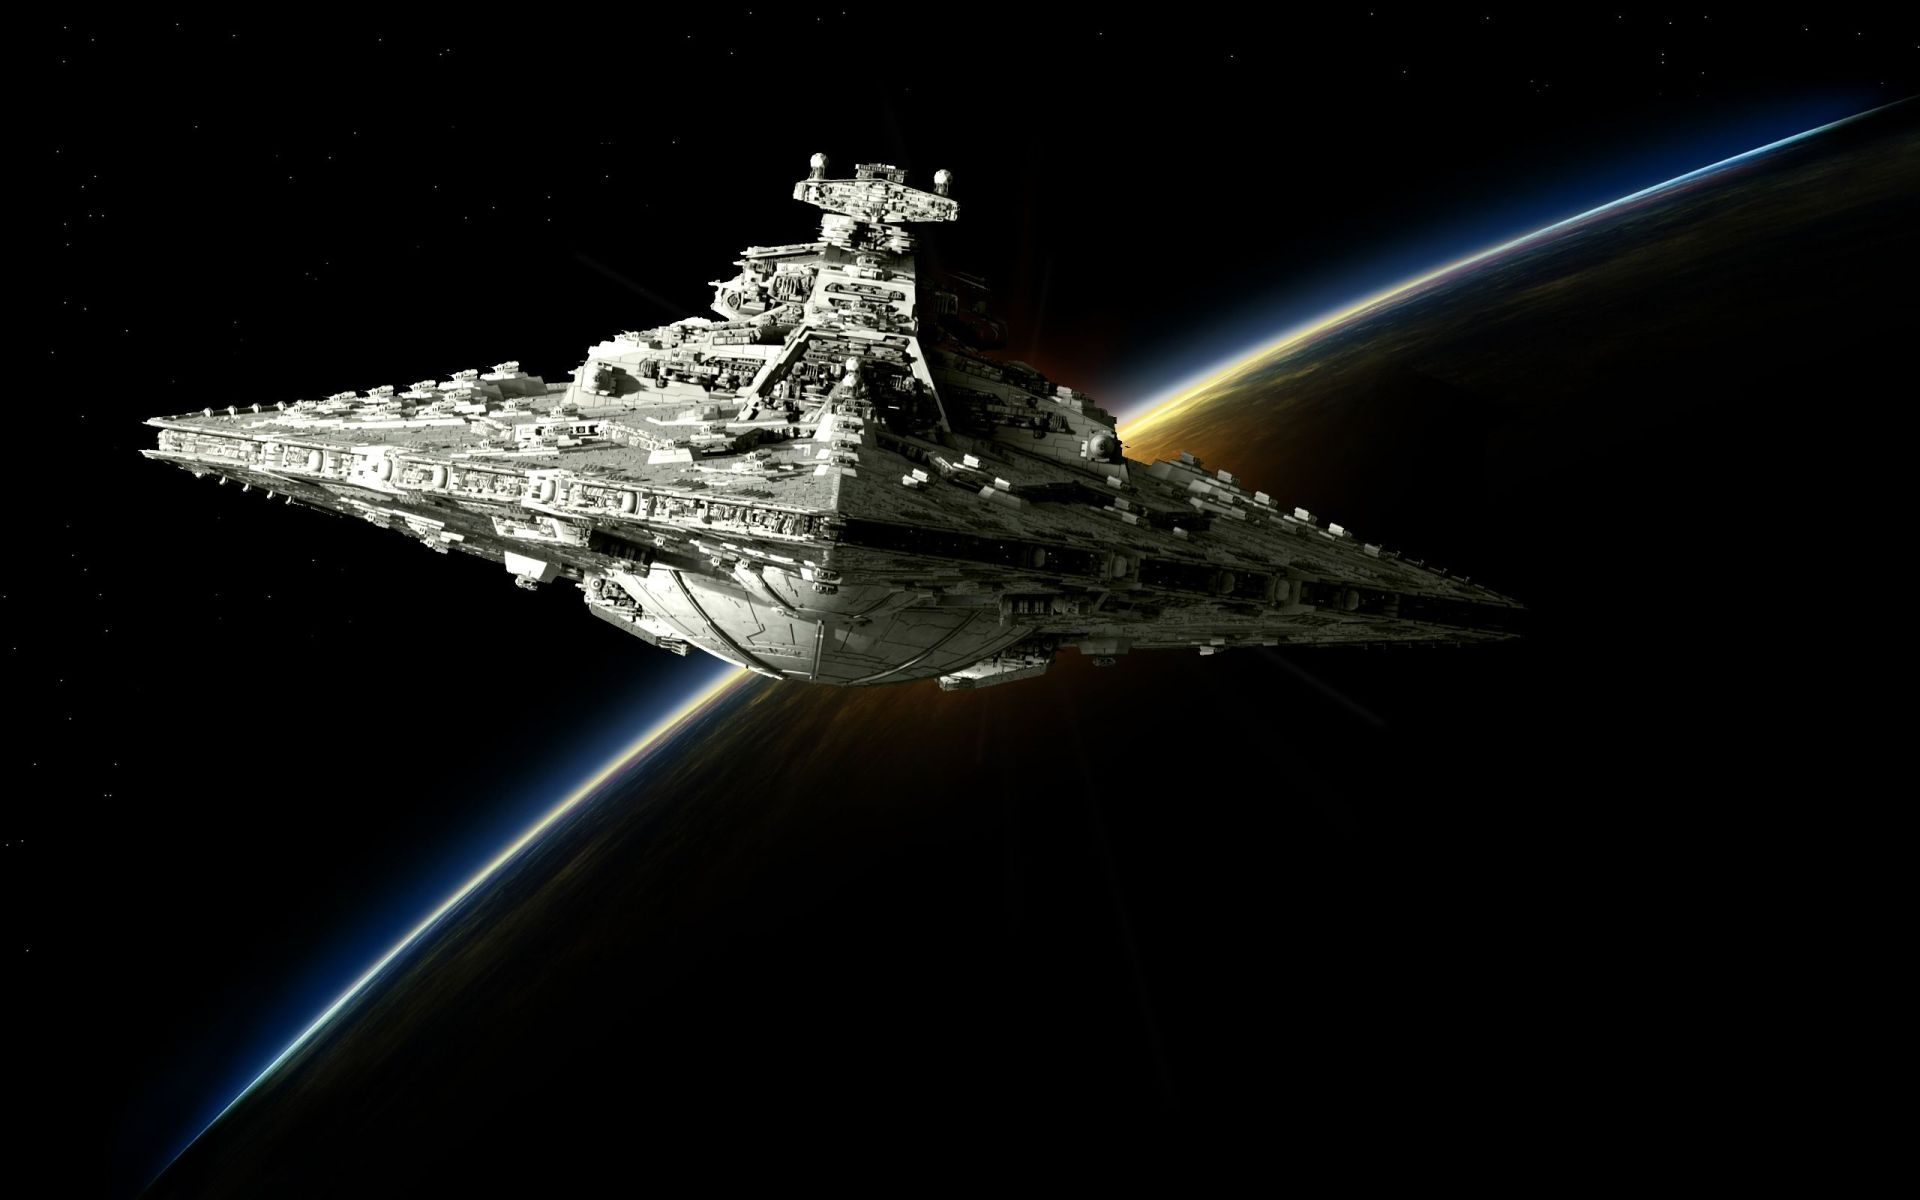 Star Wars Screensaver full screen hd wallpaper